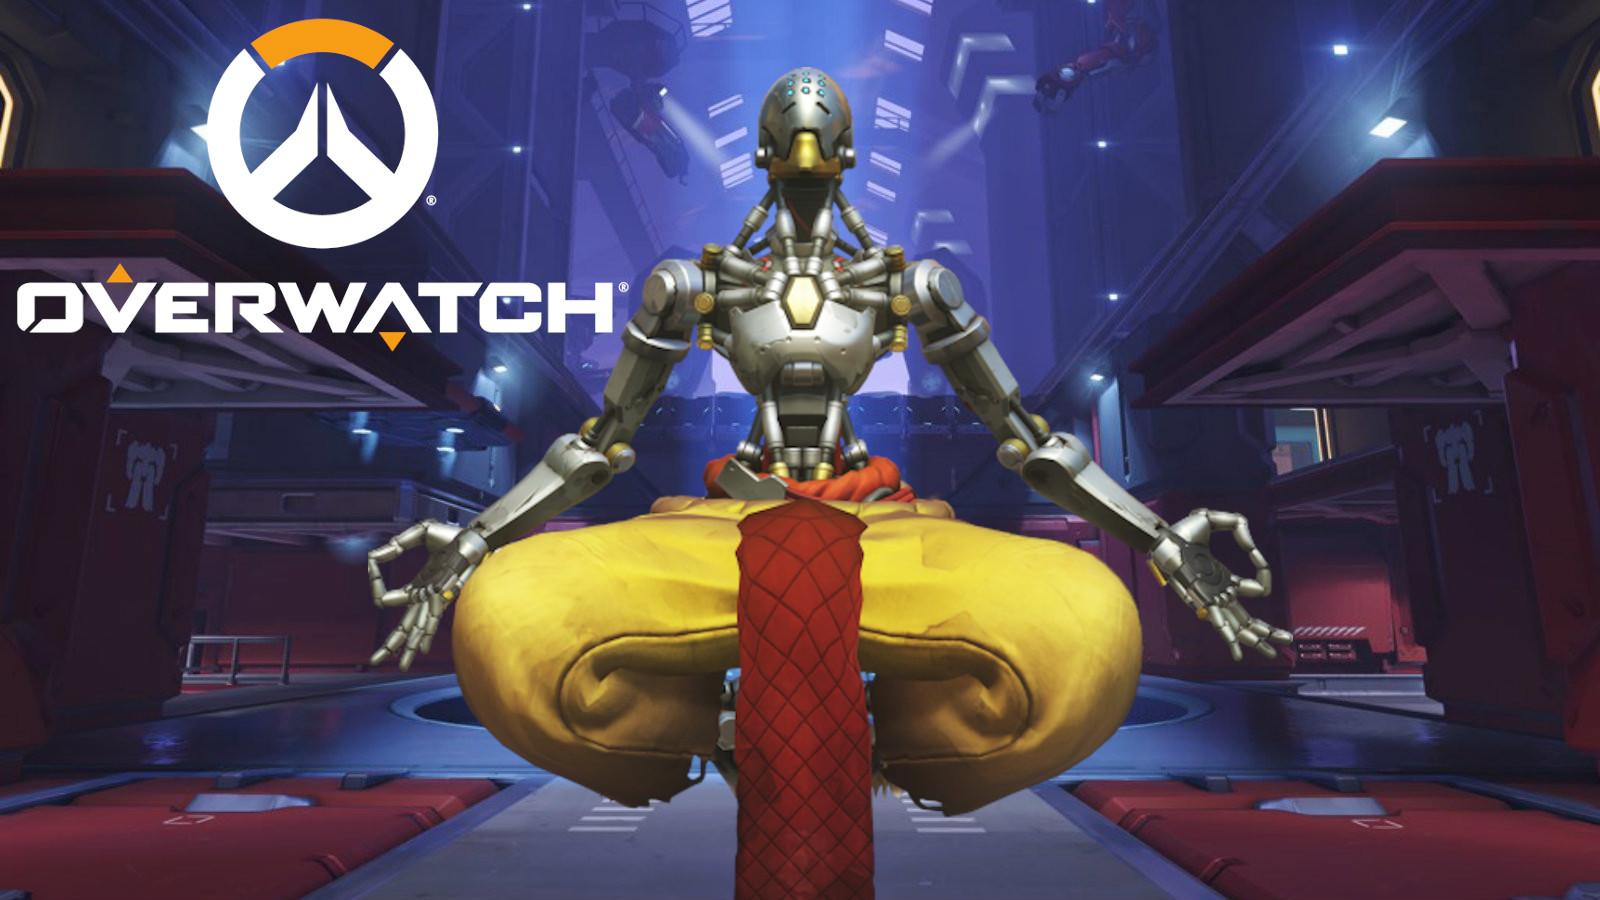 Zenyatta poses on Overwatch's Volskaya Industries map